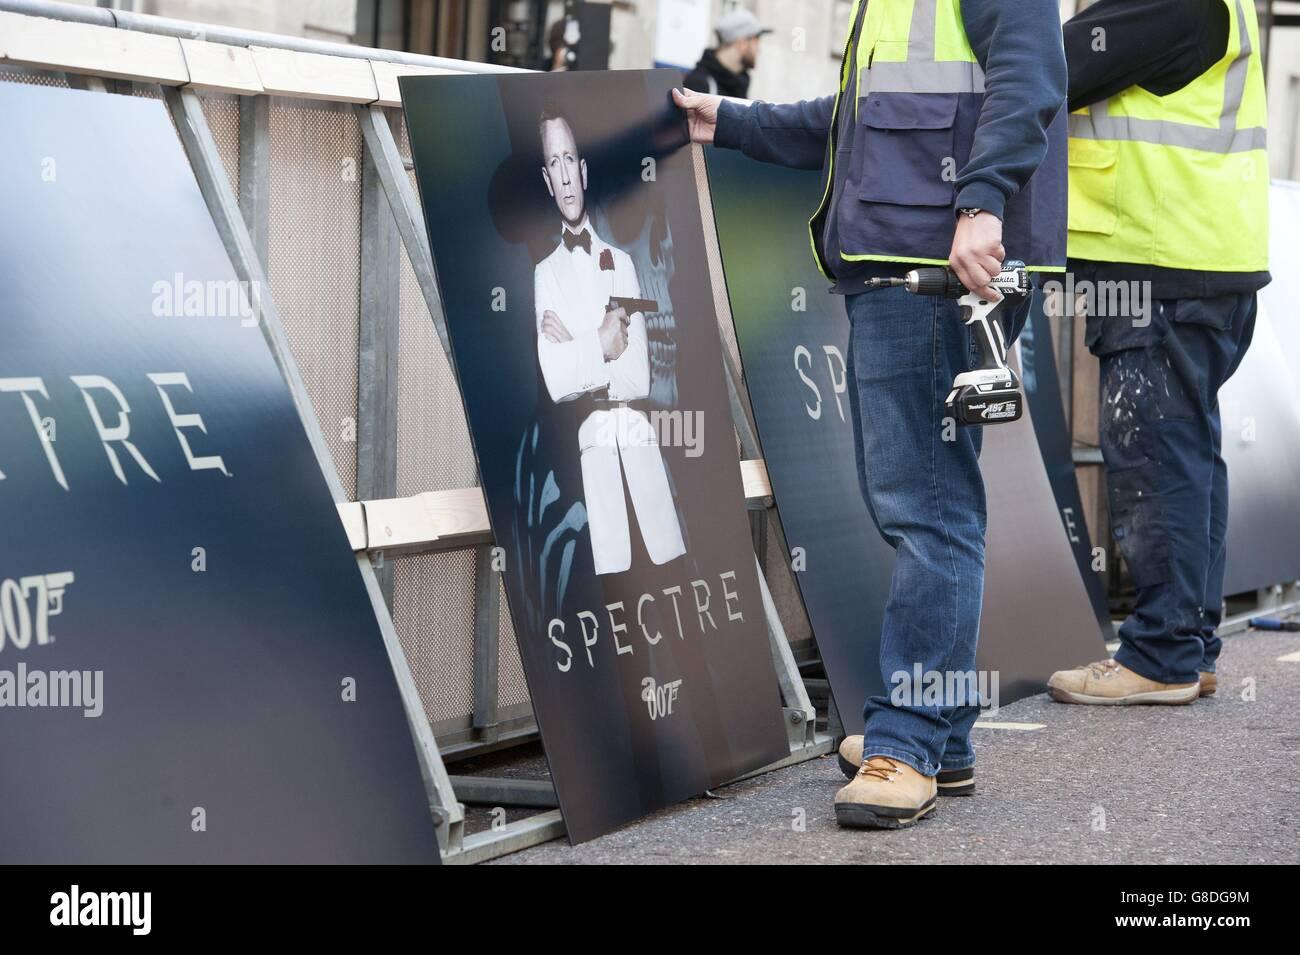 Spectre premiere - Preparations - London - Stock Image